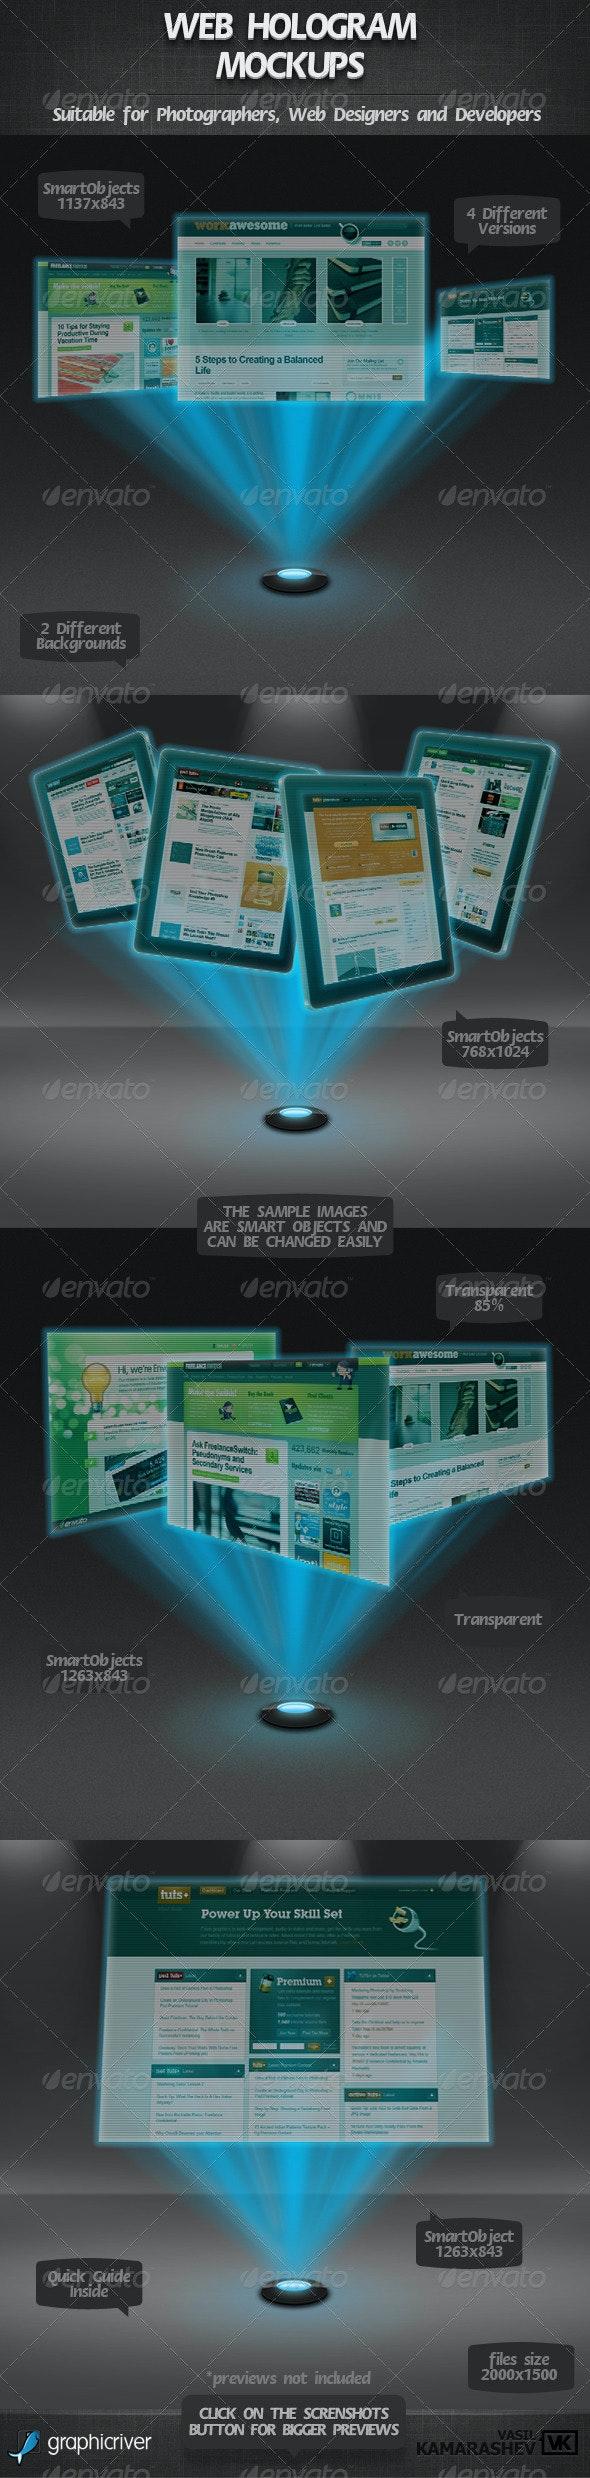 Web Hologram Mockups - Multiple Displays